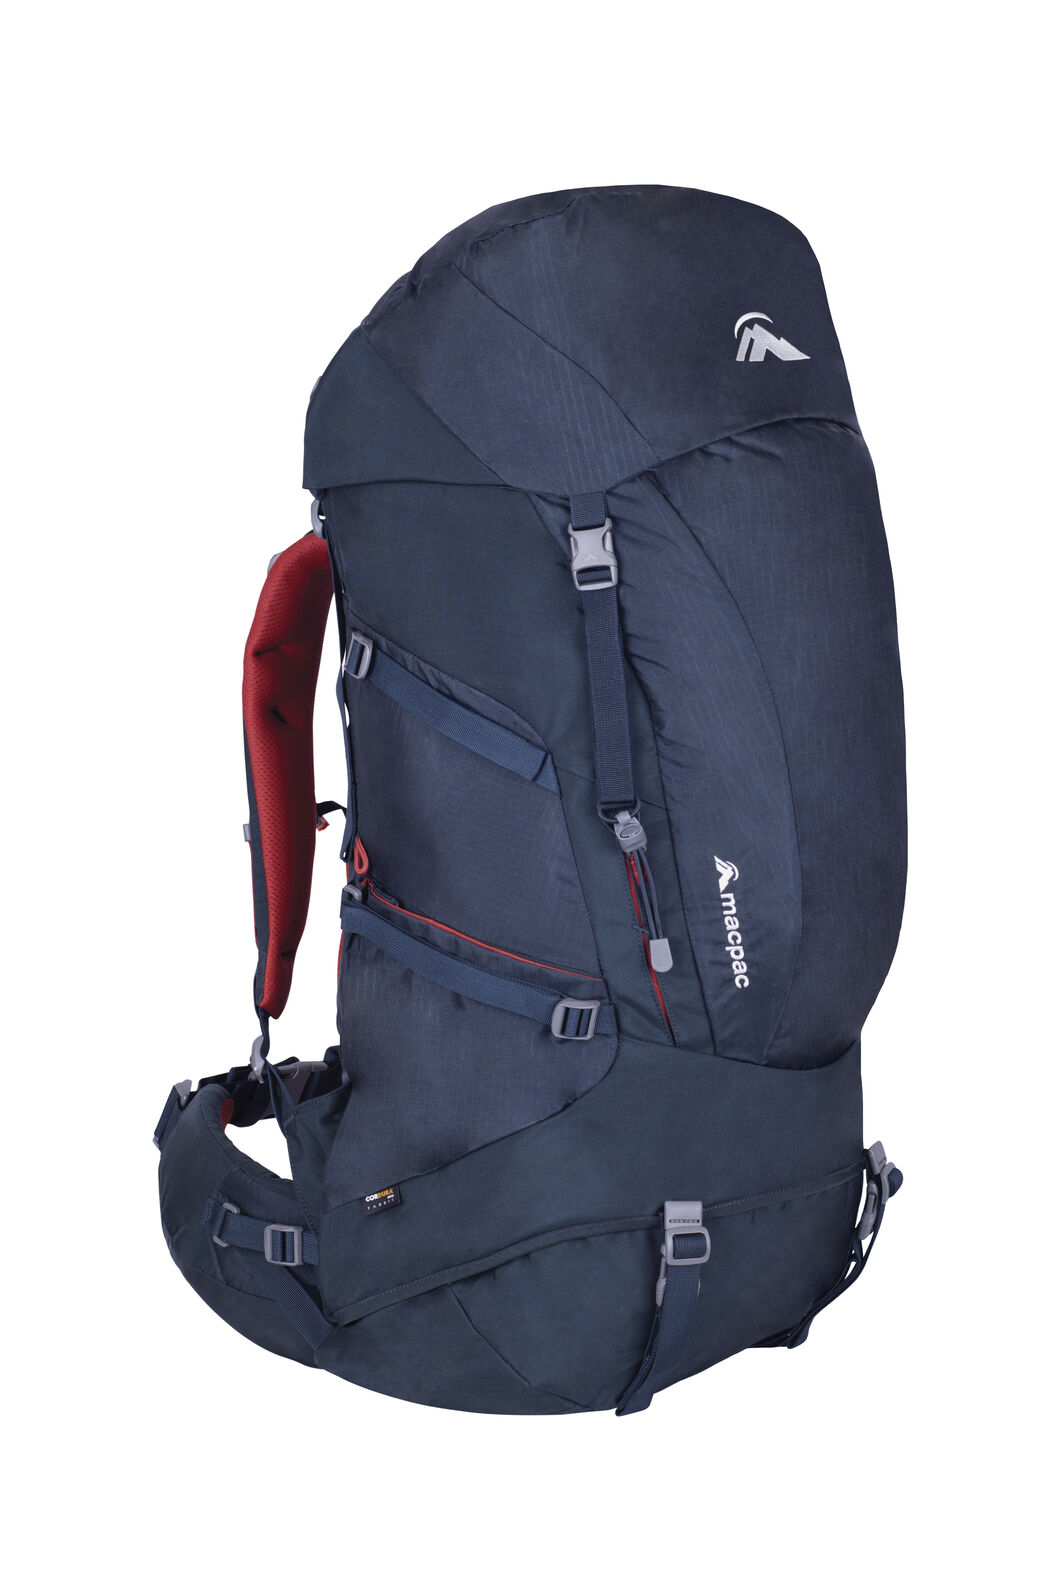 Torlesse 50L Hiking Pack, Carbon, hi-res